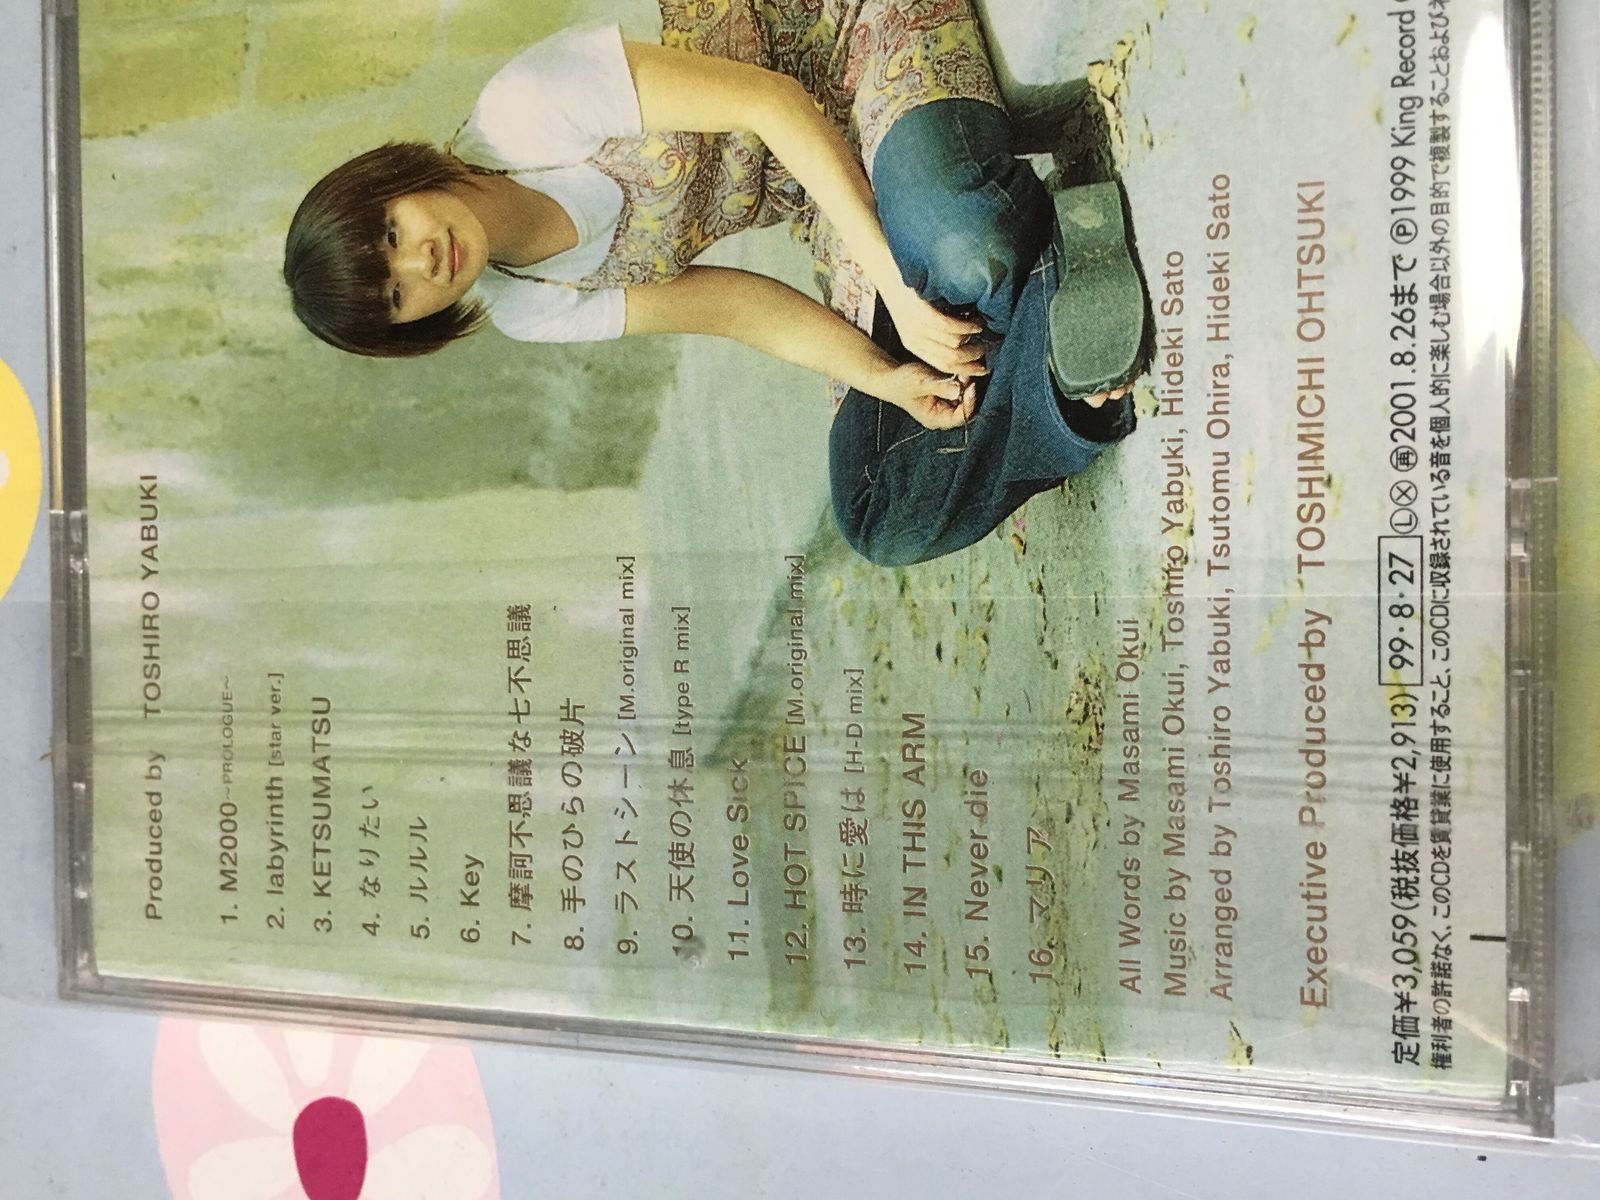 MASAMI OKUI JAPAN VERSION ALBUM CD HER-RAY